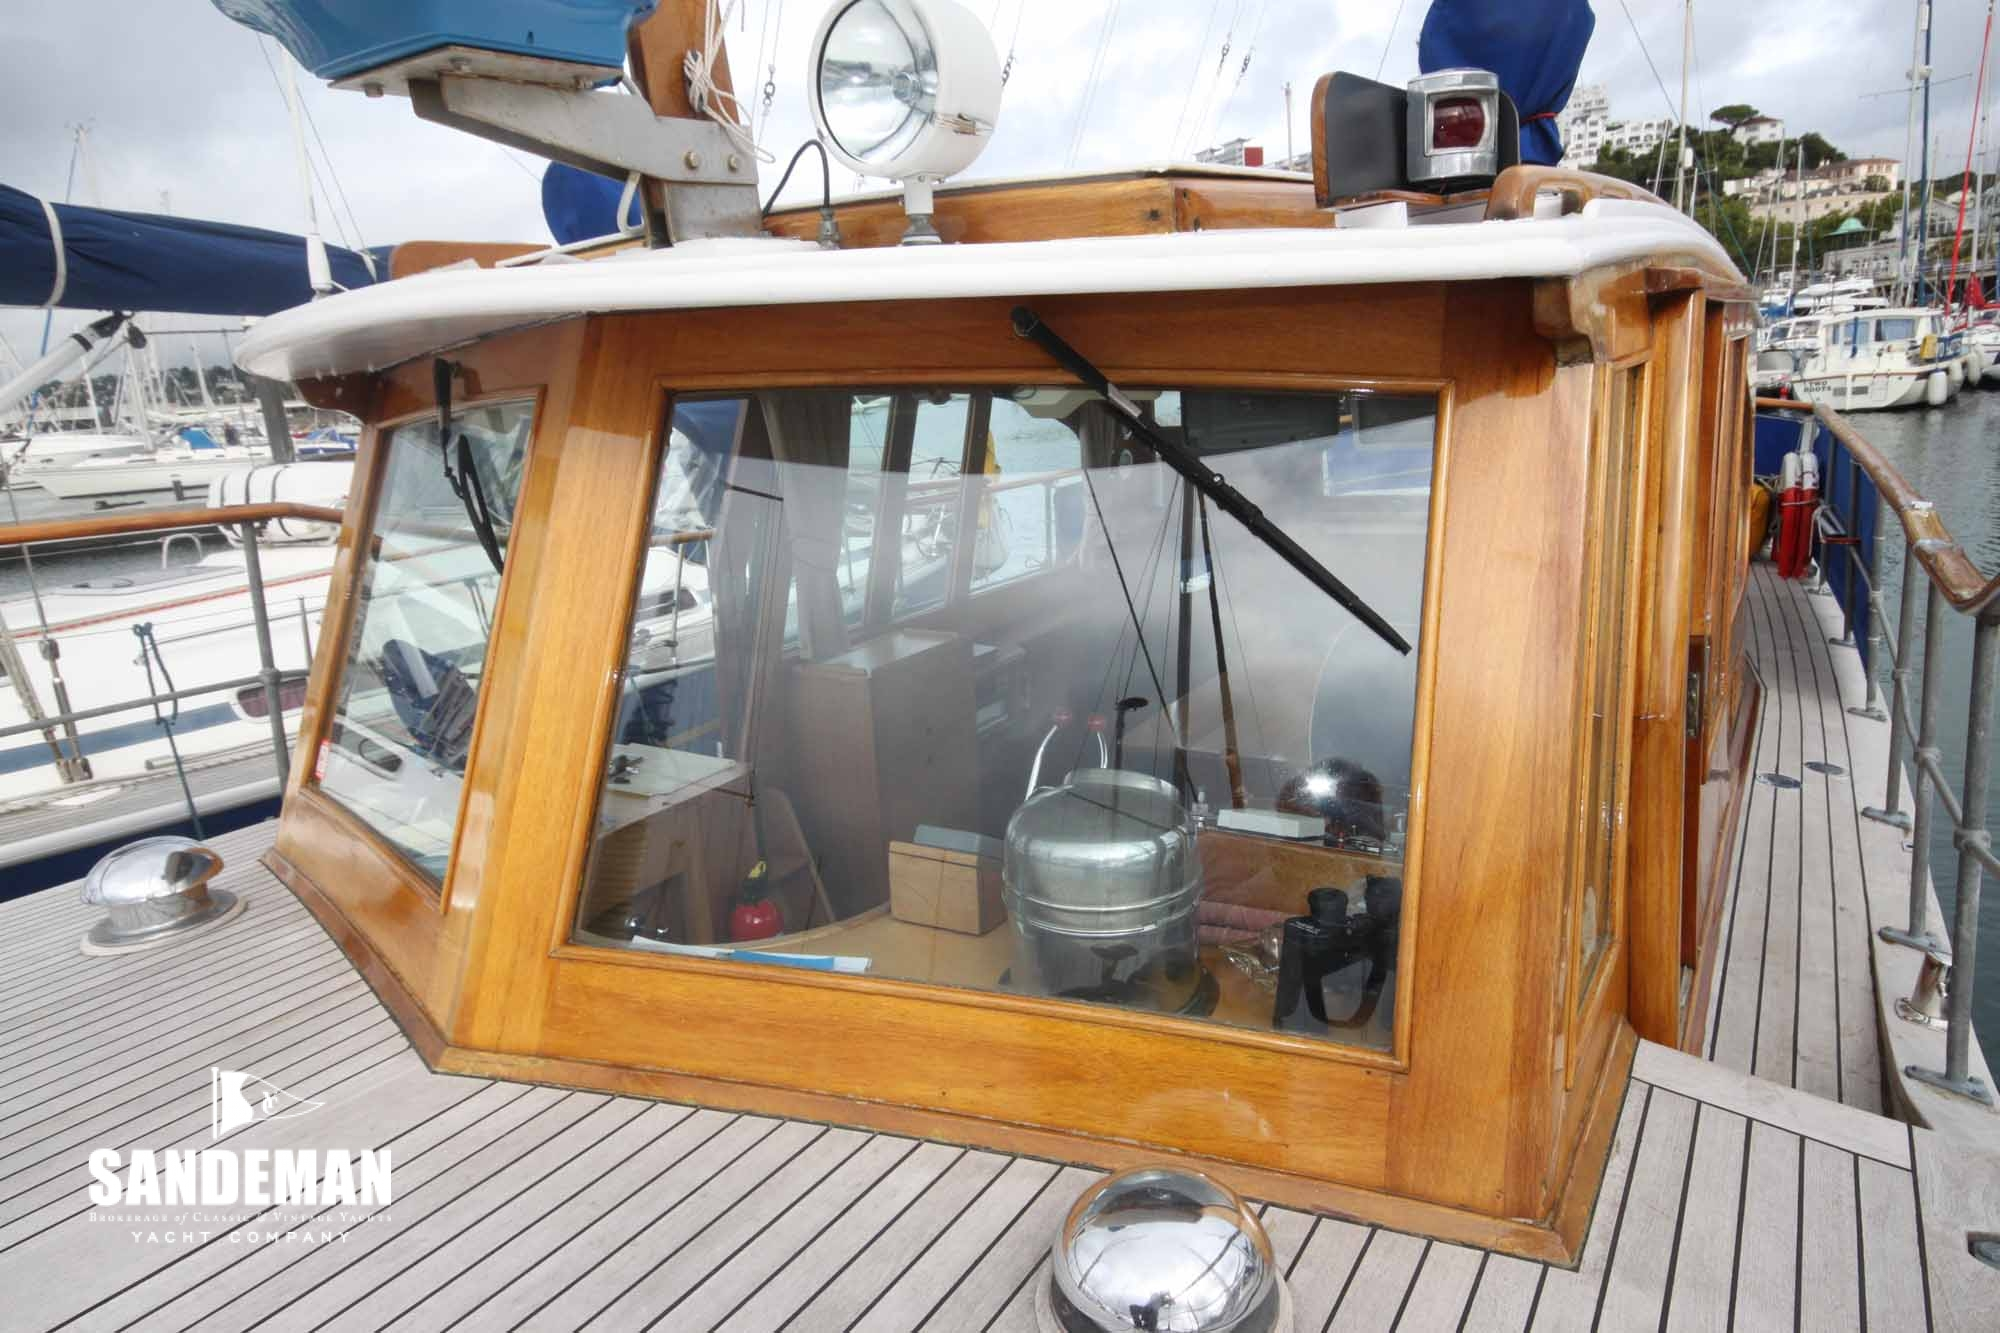 John Bain Staniland 40 ft Motor Yacht 1963 - Sandeman Yacht Company